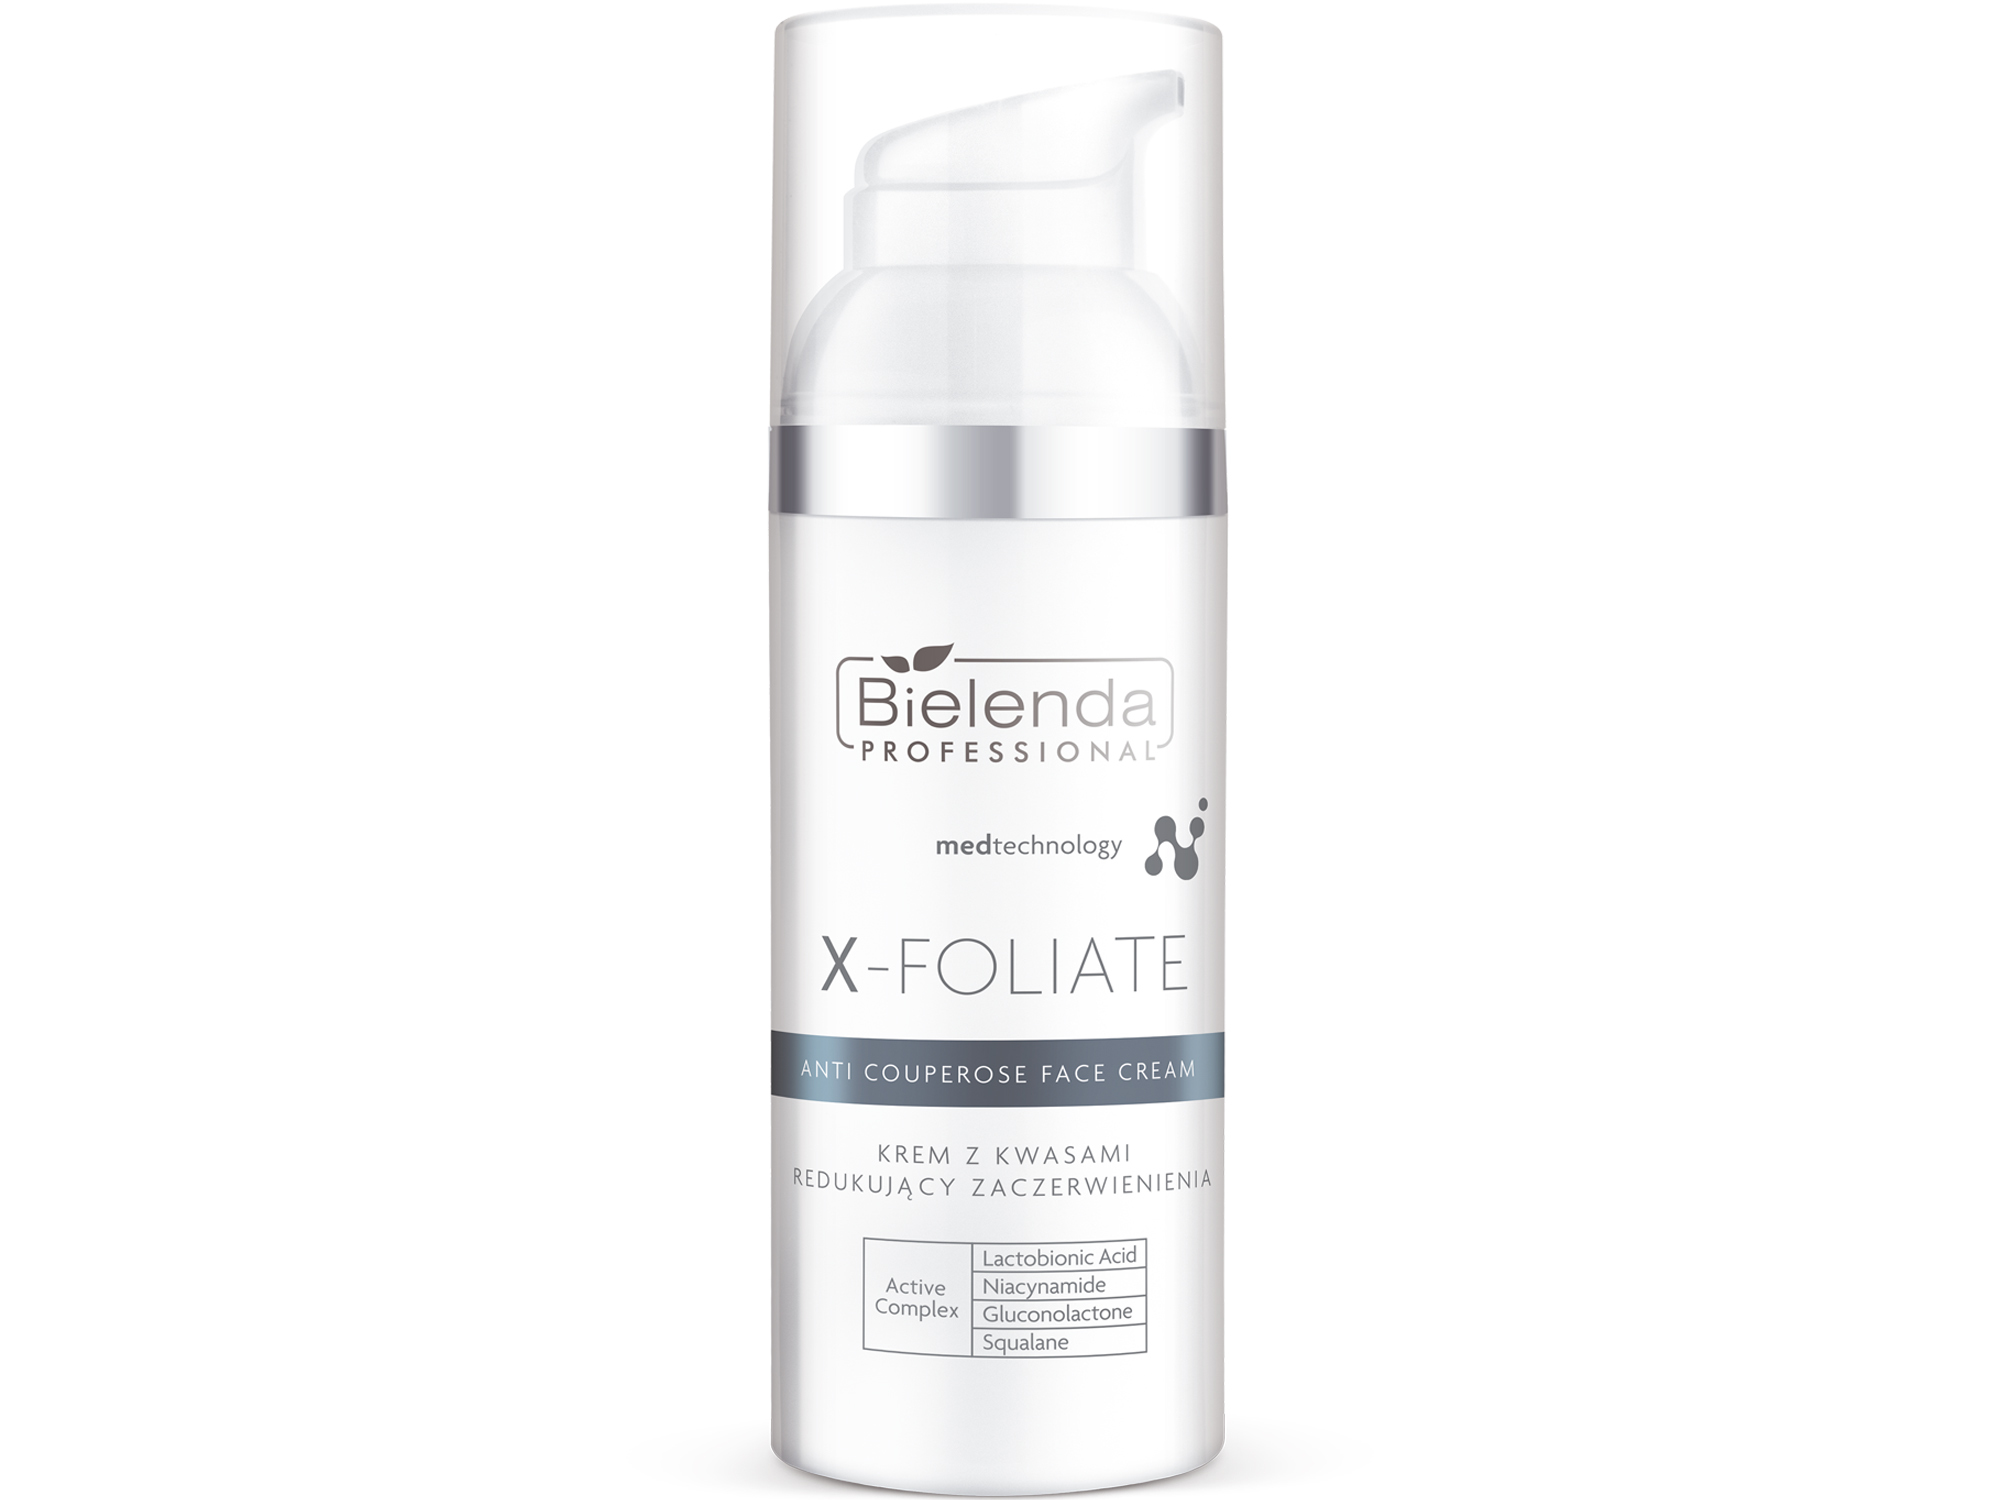 X-FOLIATE Anti Couperose Крем для лица  с кислотами склонной к куперозу, 50 мл.